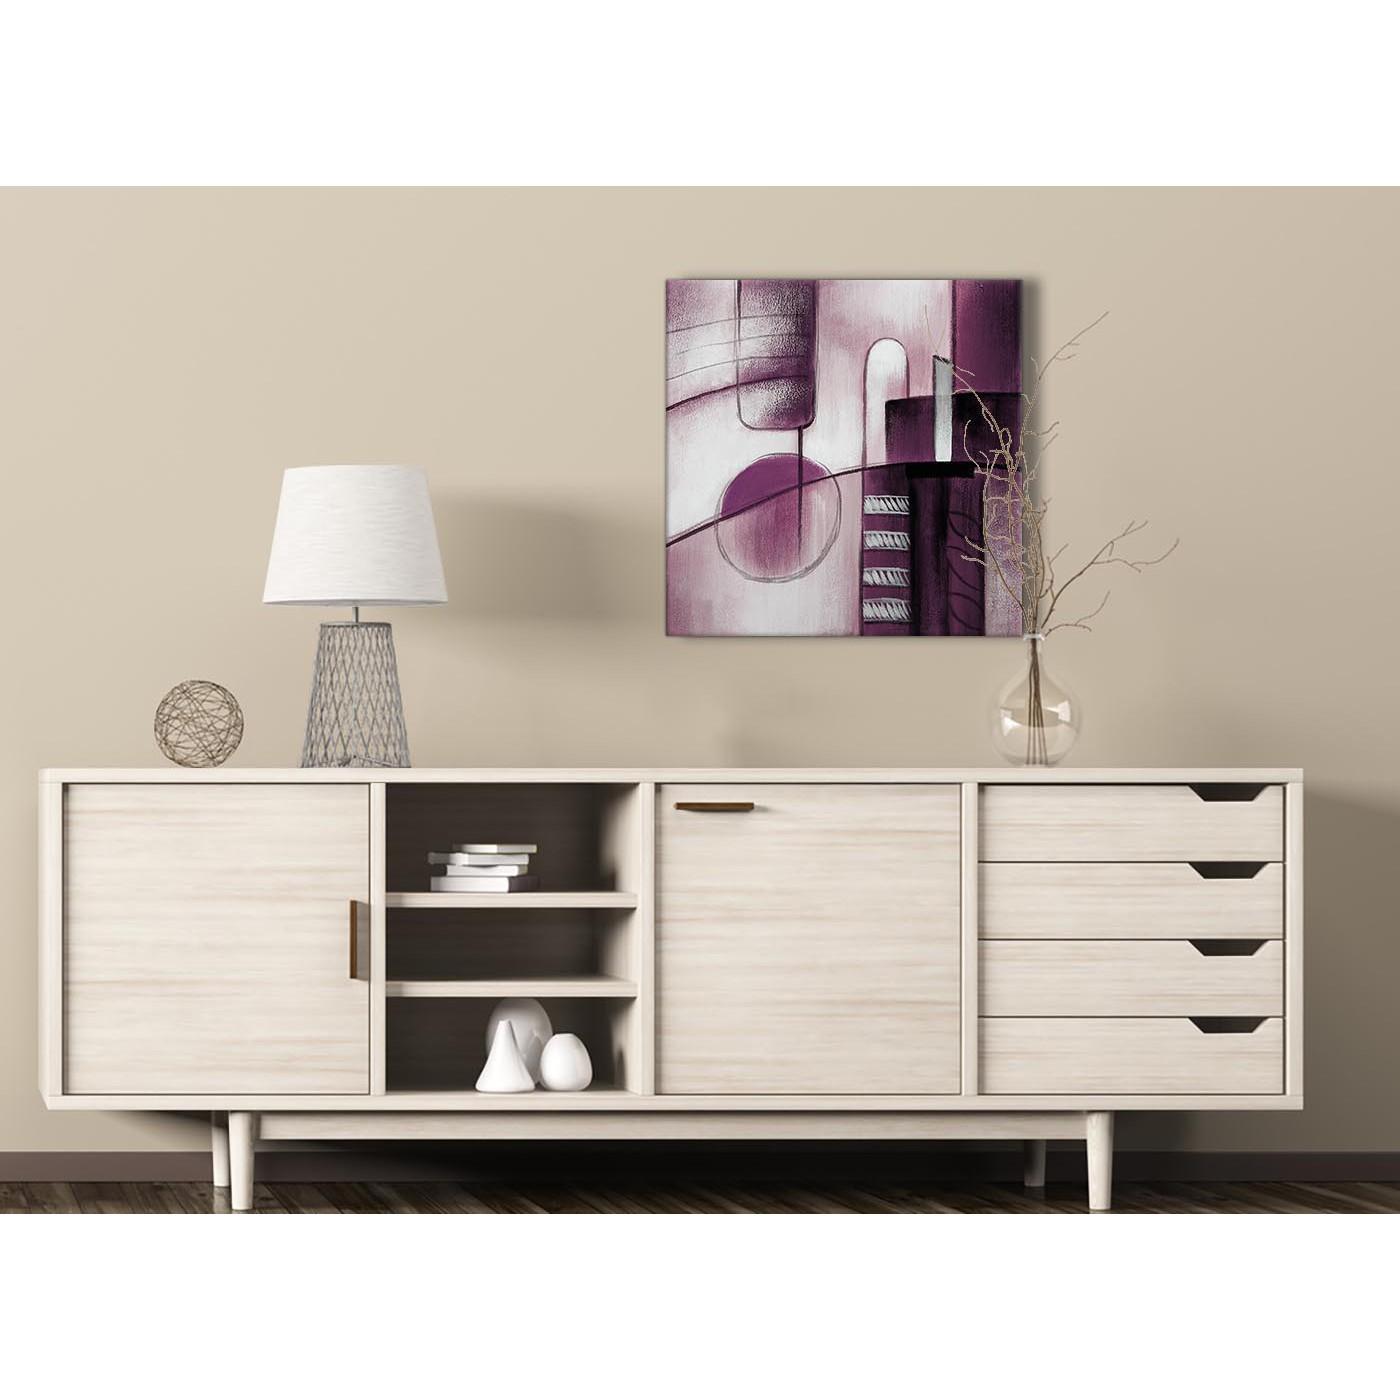 Plum Purple Grey Painting Kitchen Canvas Pictures: Plum Grey Painting Hallway Canvas Wall Art Decor